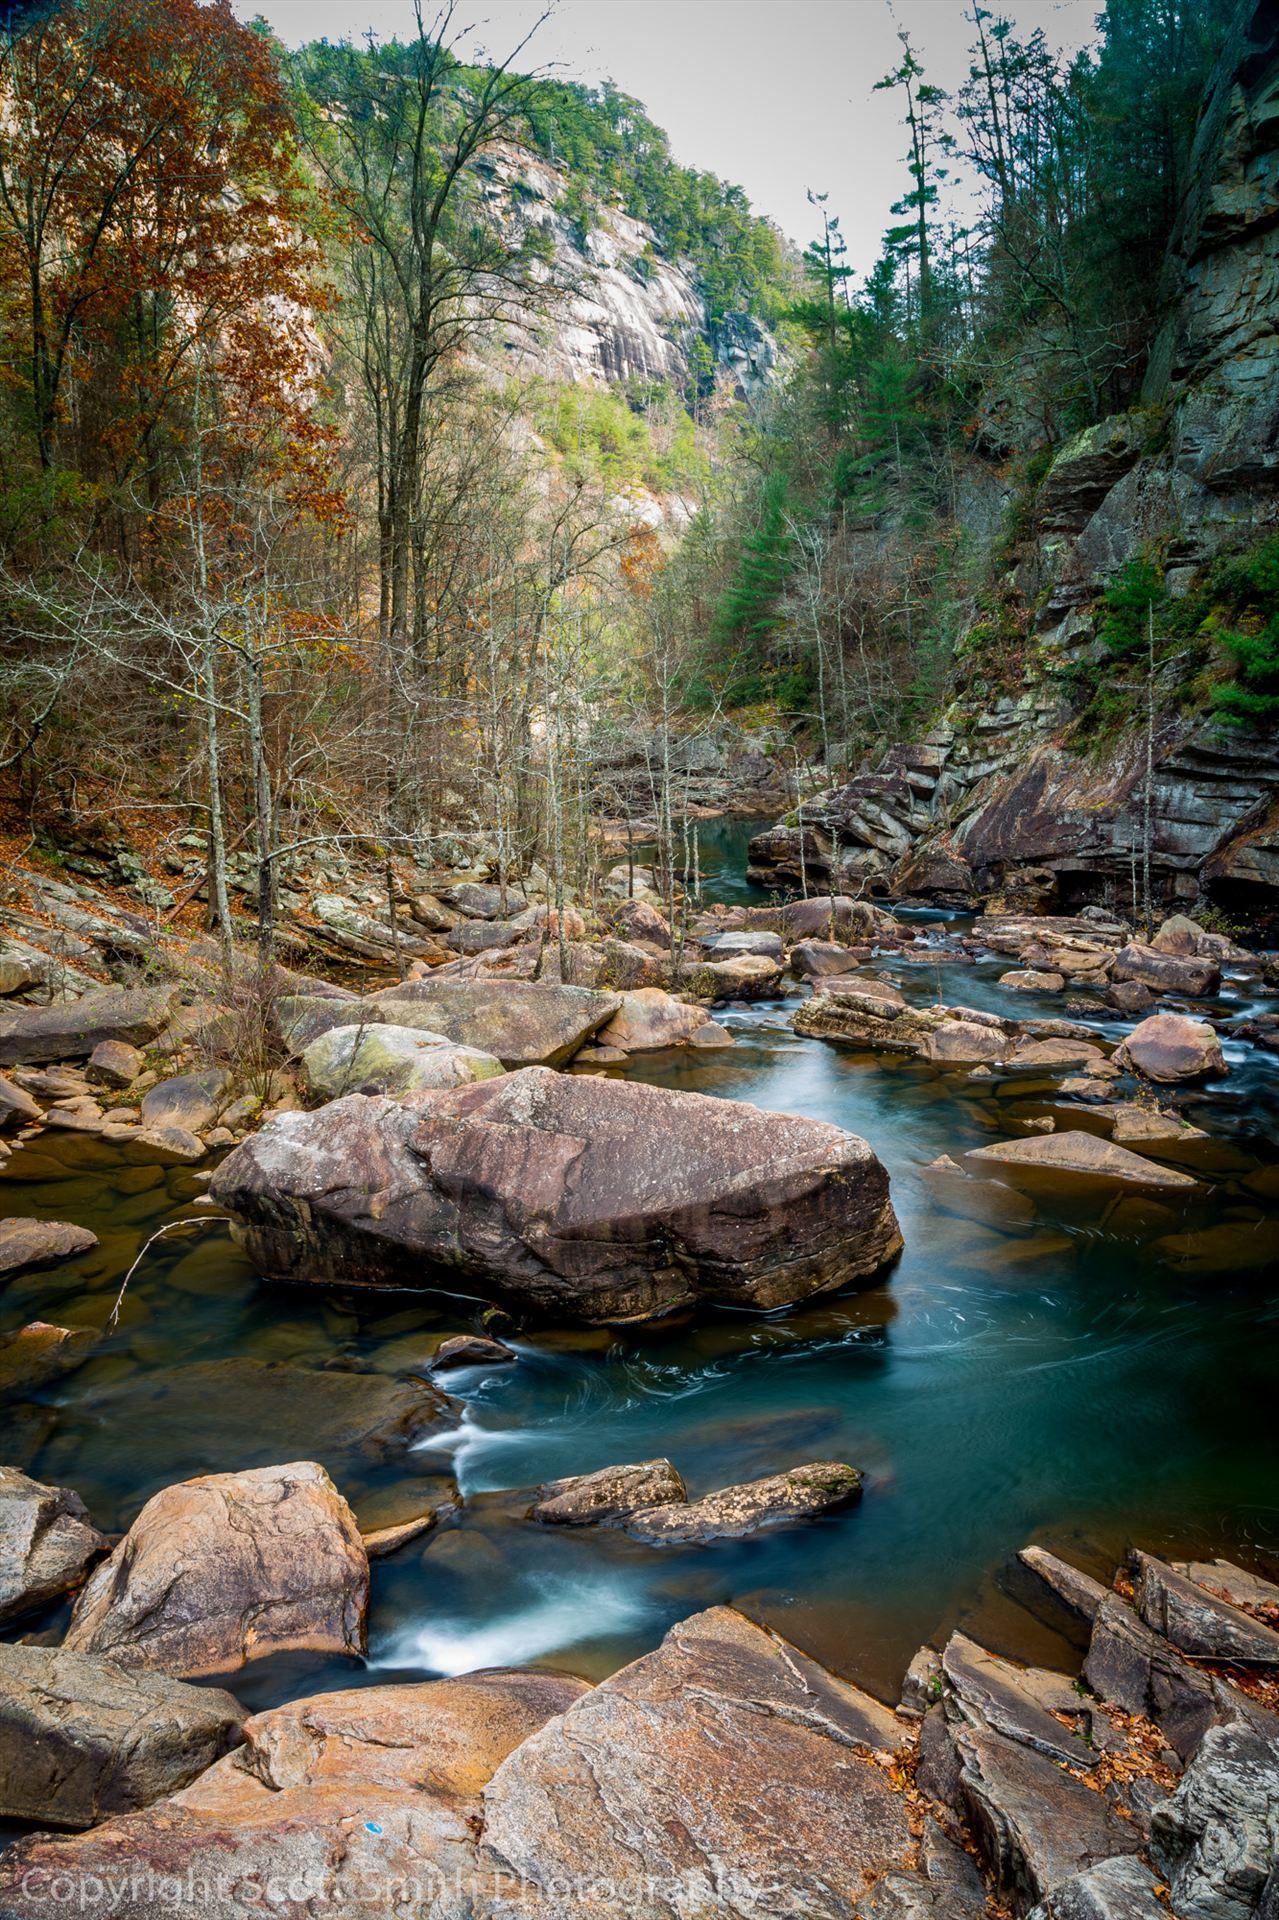 Tallulah Gorge Downstream -  by D Scott Smith